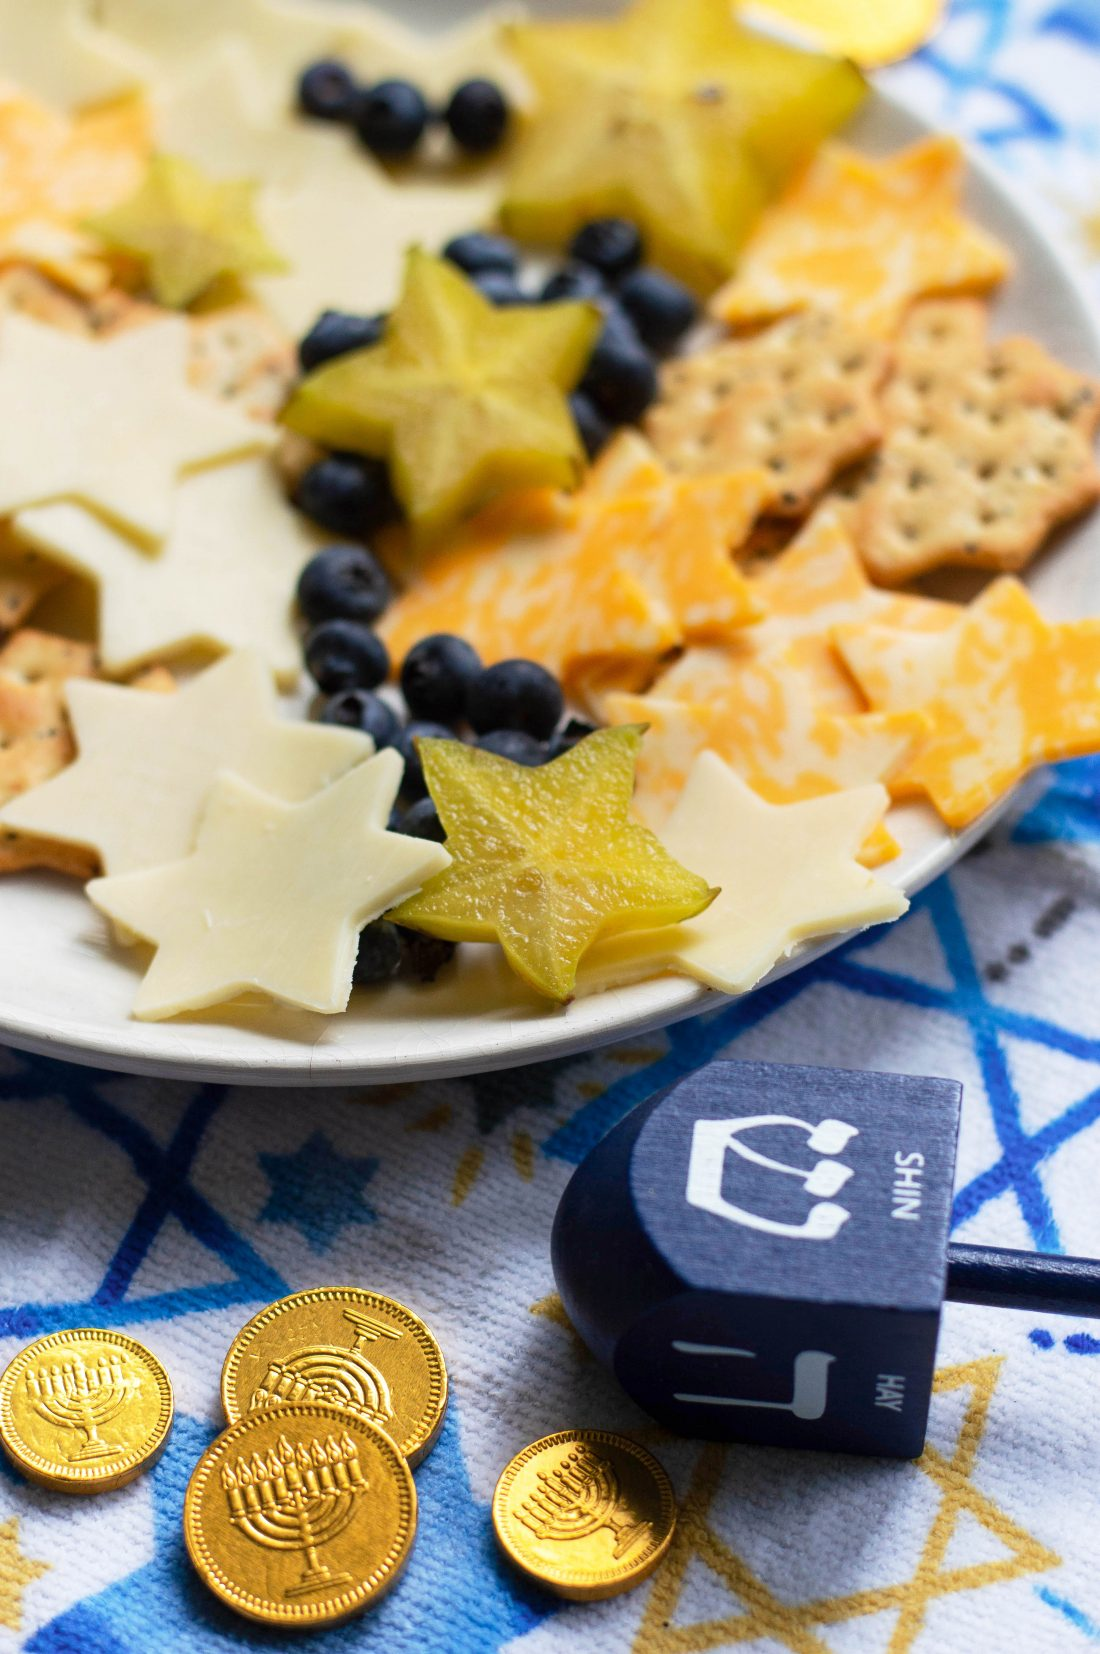 Starry Night Cheese Plate Aurora Satler